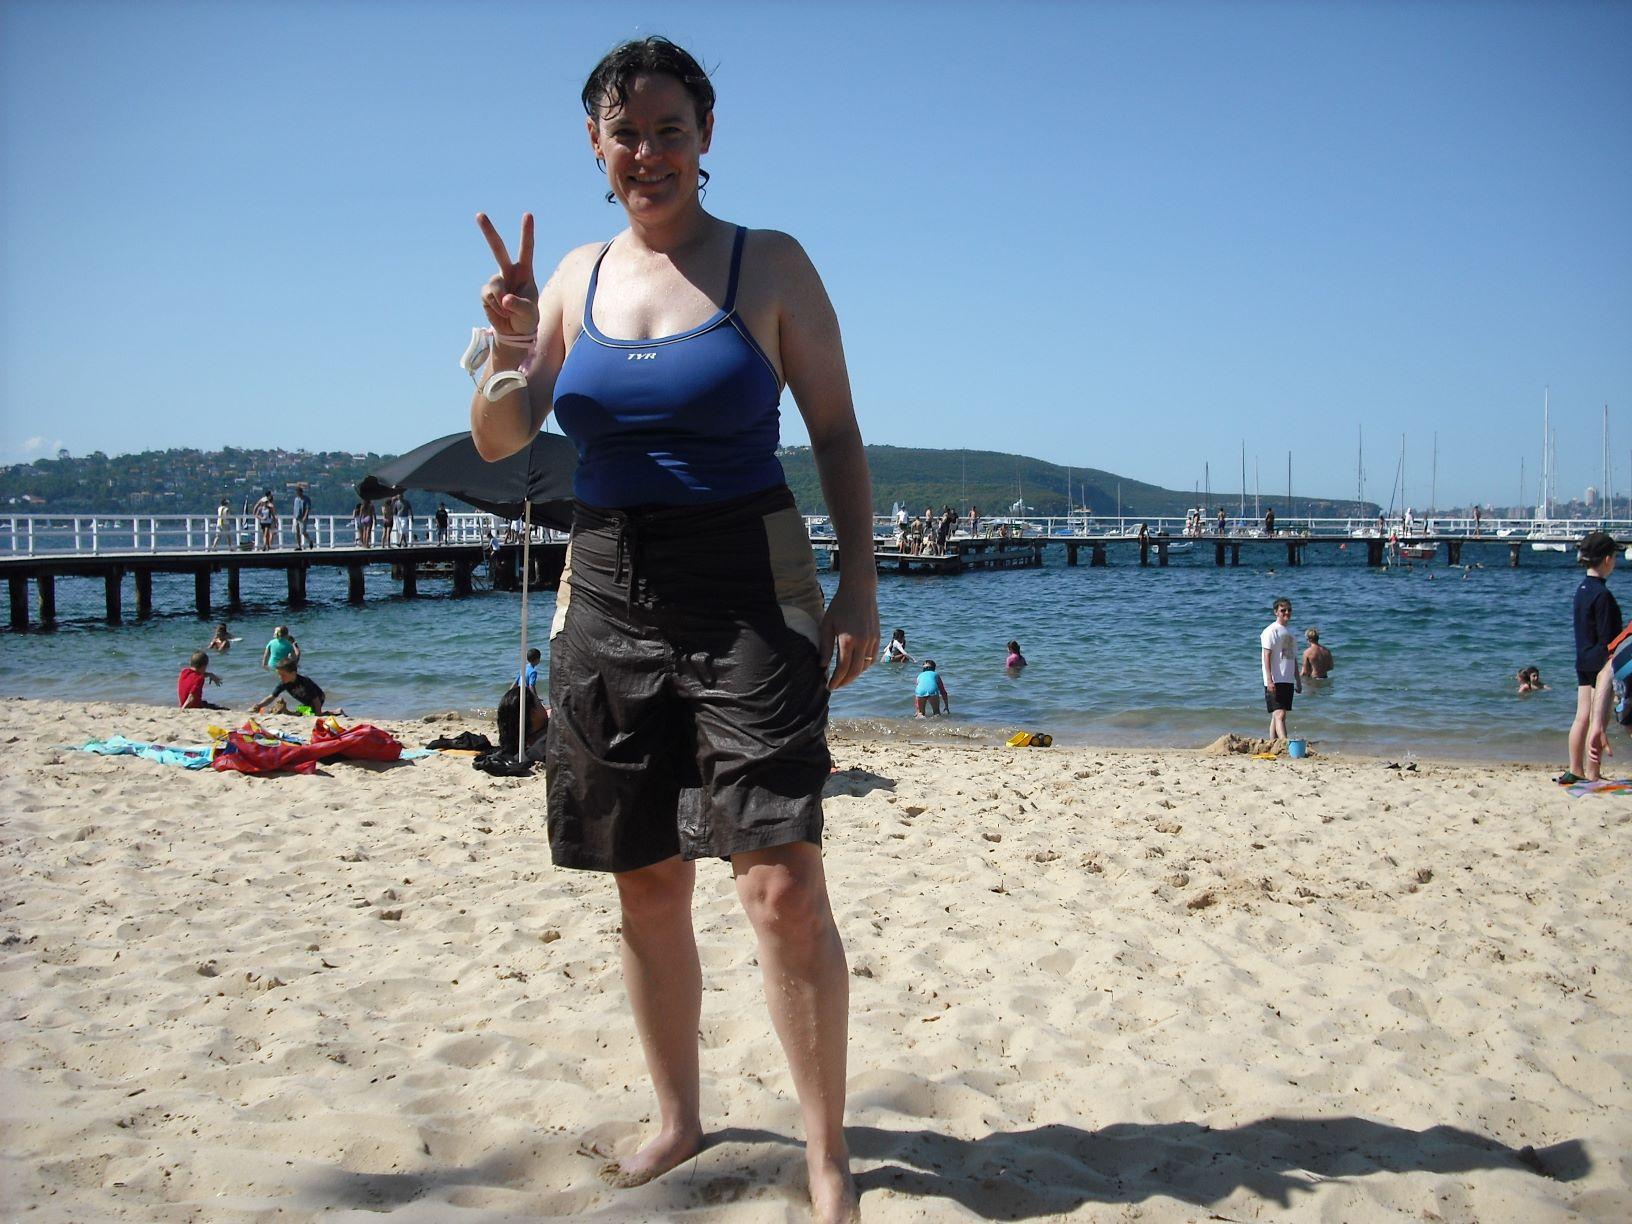 No 2: Balmoral Beach – 21 February 2010